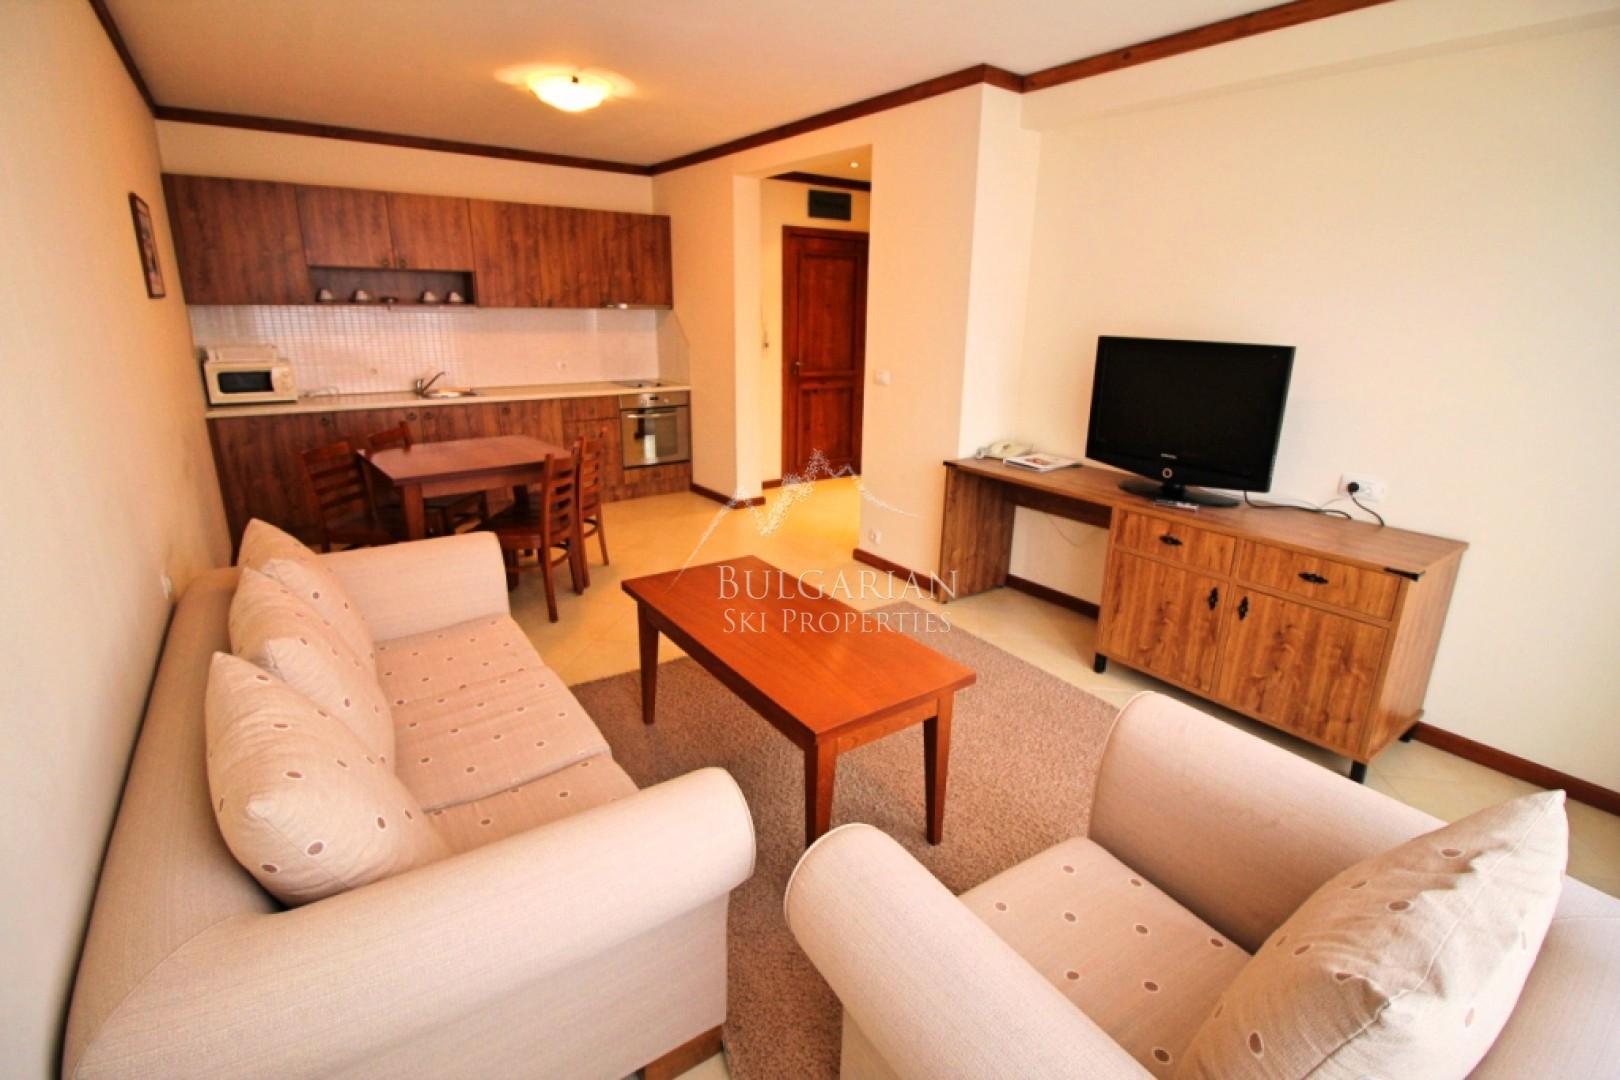 Банско: обзаведен двустаен апартамент за продажба в целогодишен комплекс Свети Иван Рилски